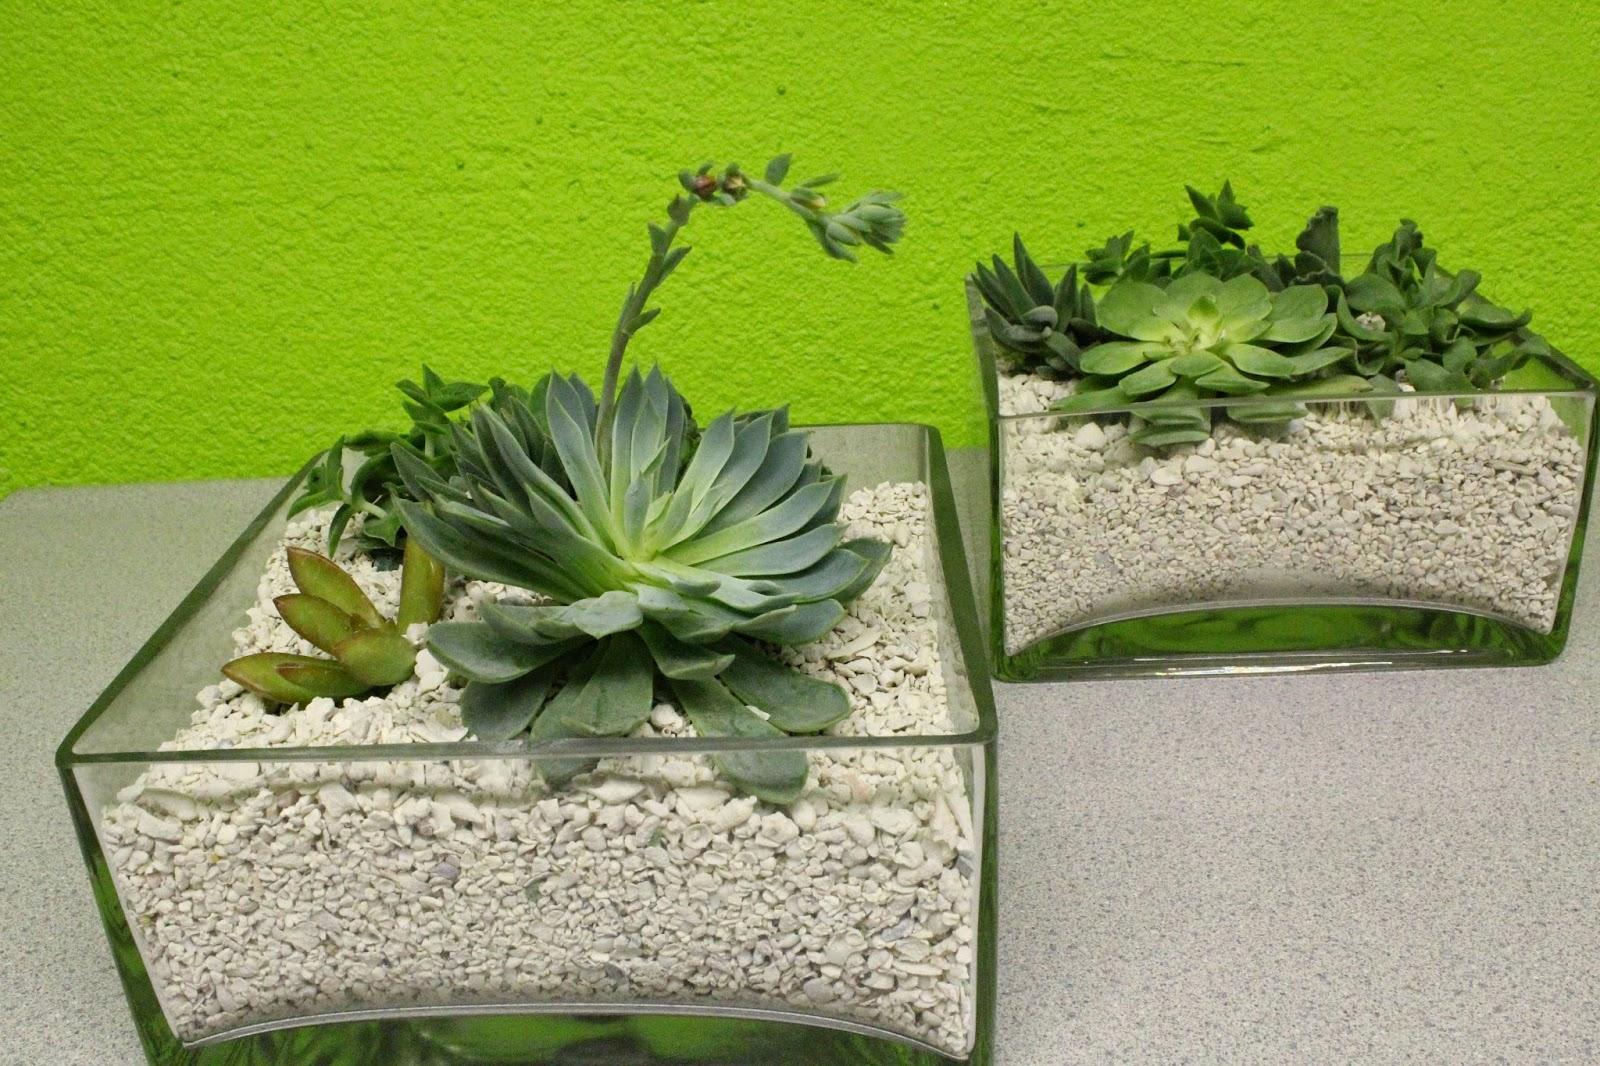 Succulents In White Gravel An Octopuss Garden Design Las Vegas